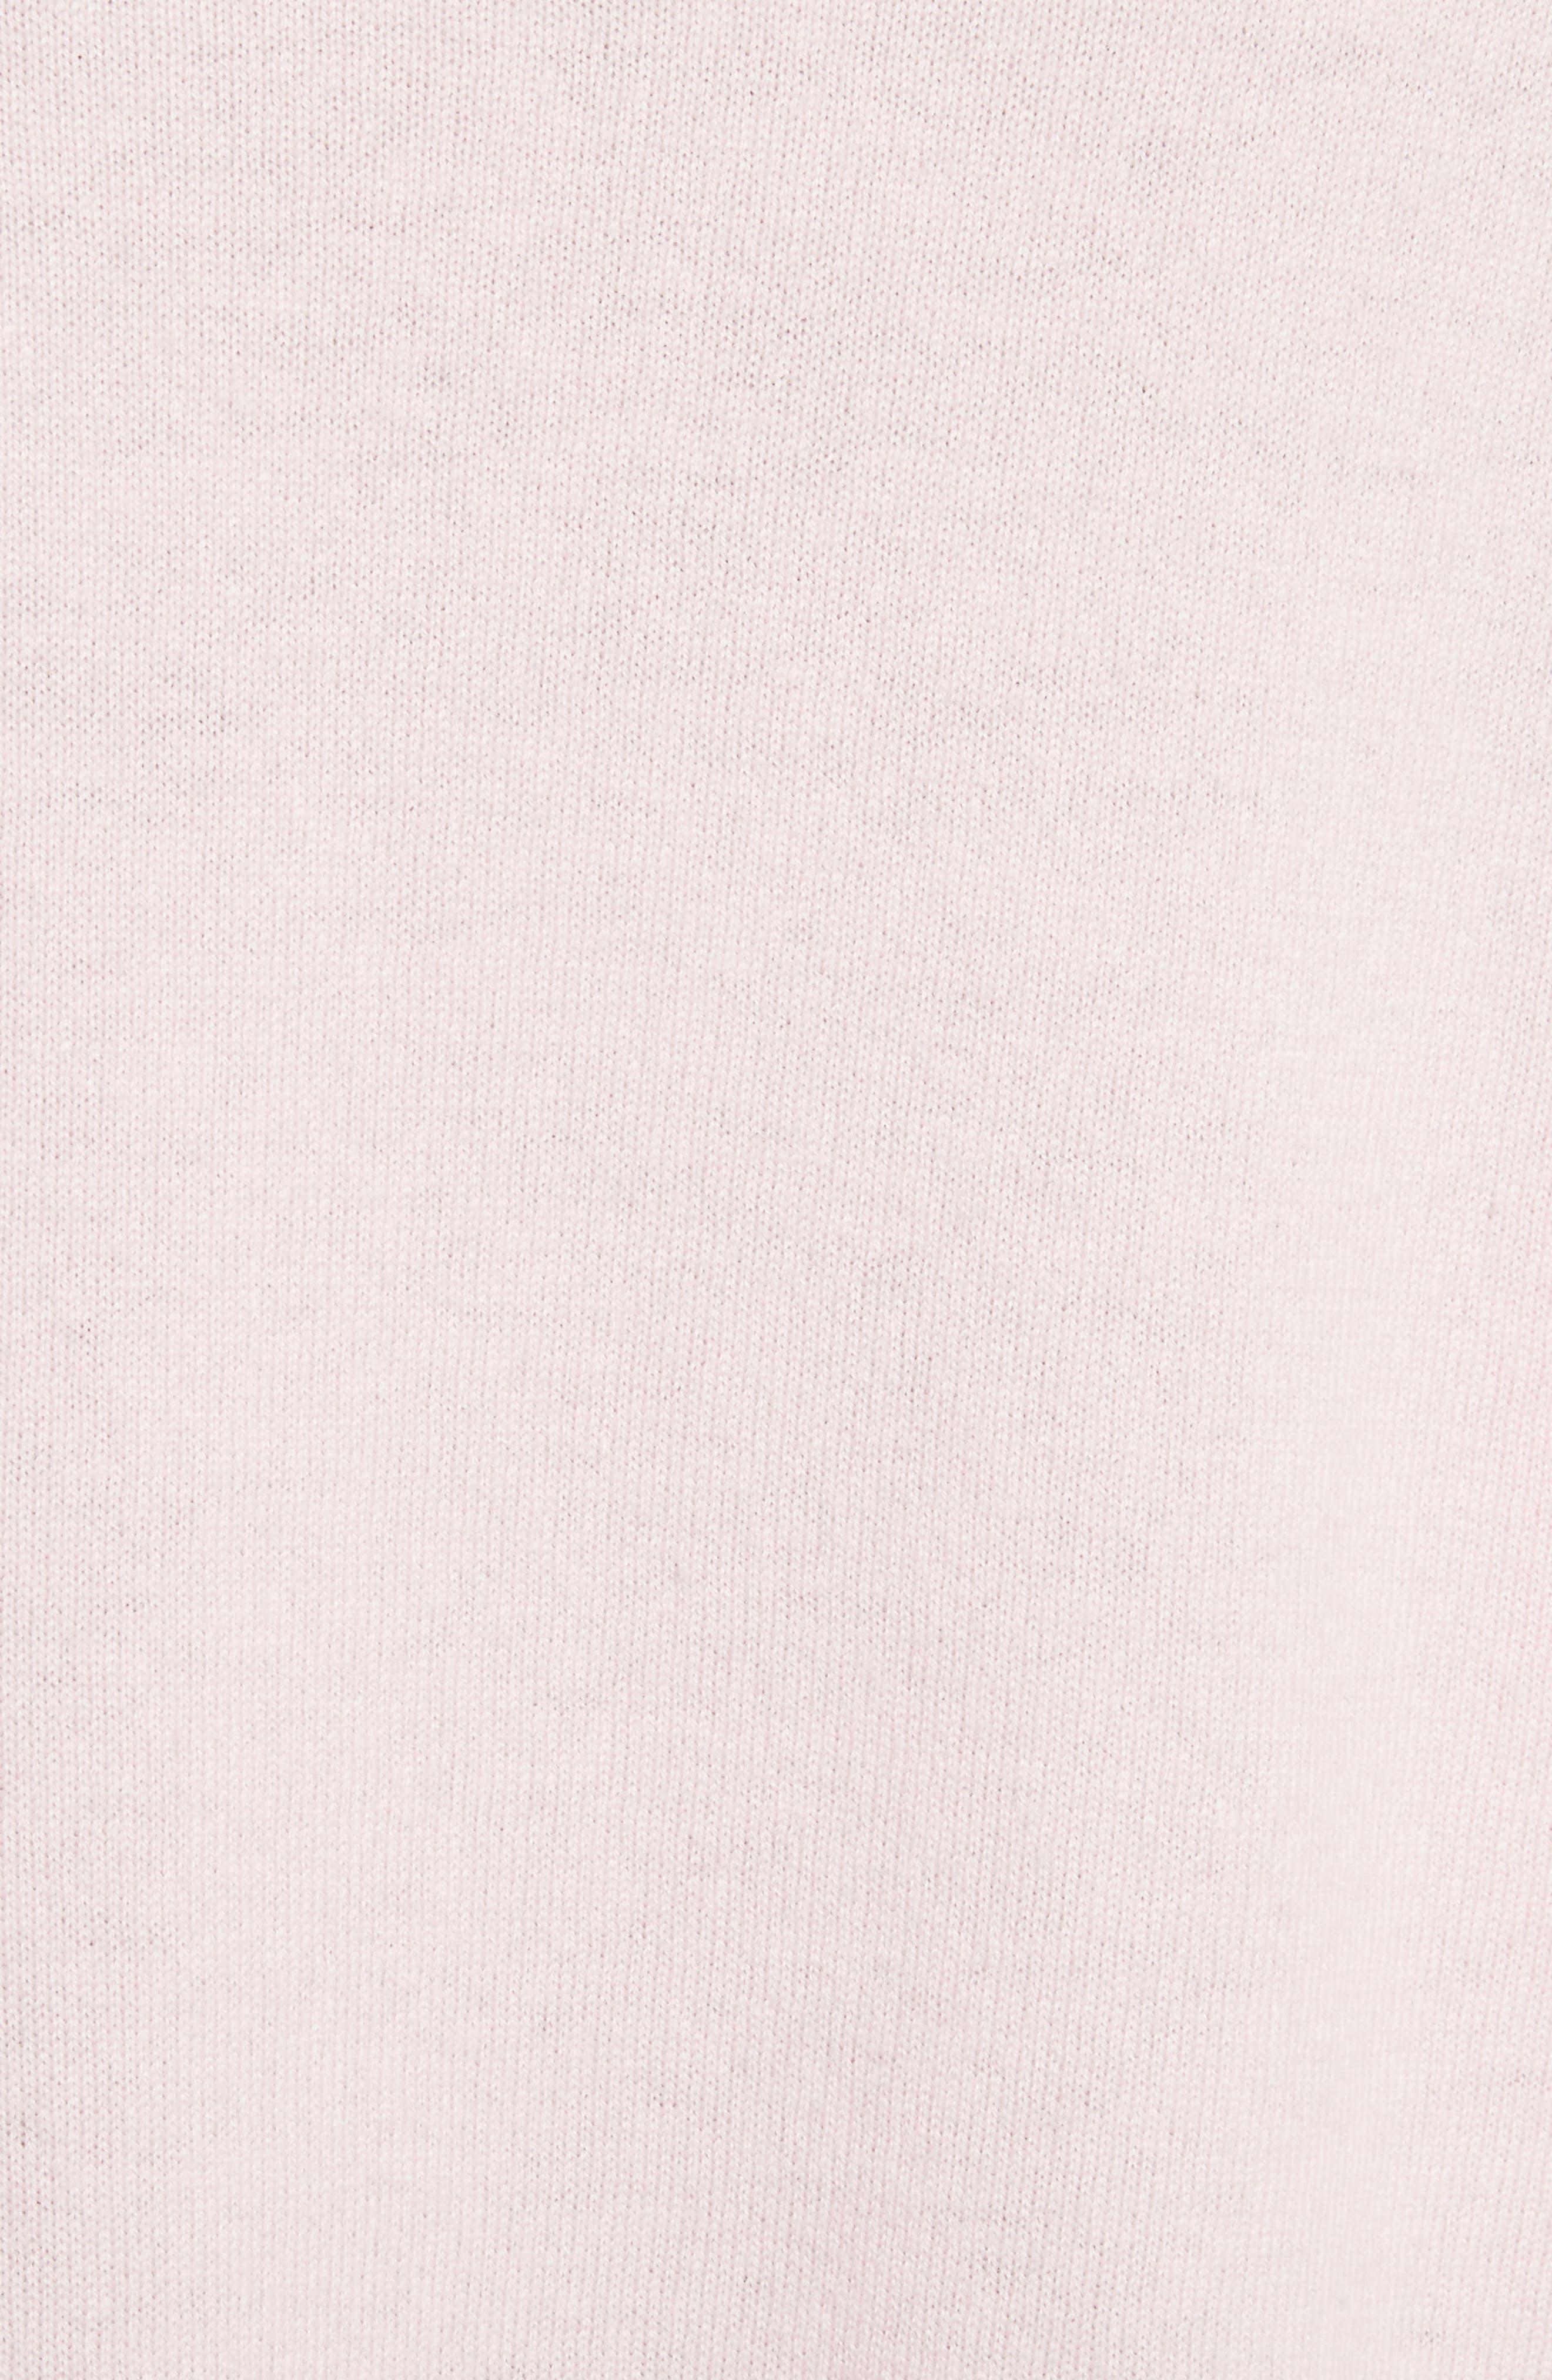 Boyfriend Sweater,                             Alternate thumbnail 5, color,                             650